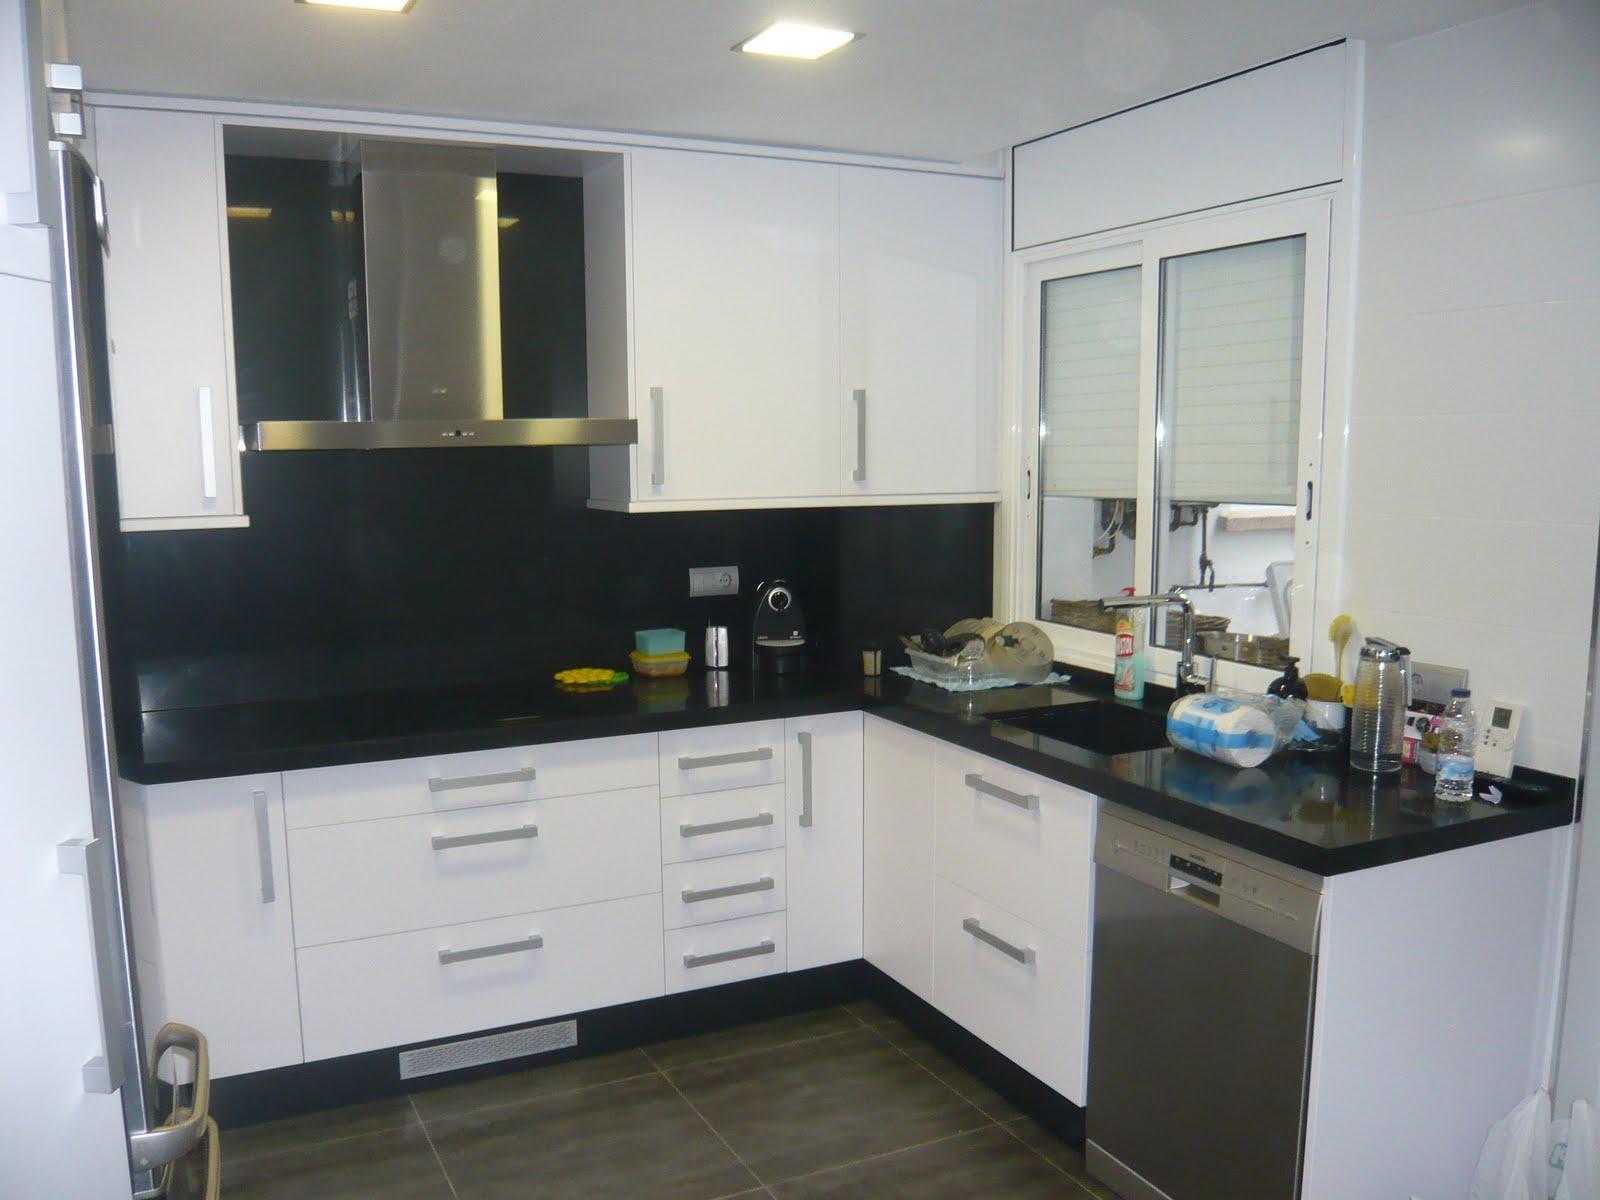 Cocina de formica blanca con silestone negro